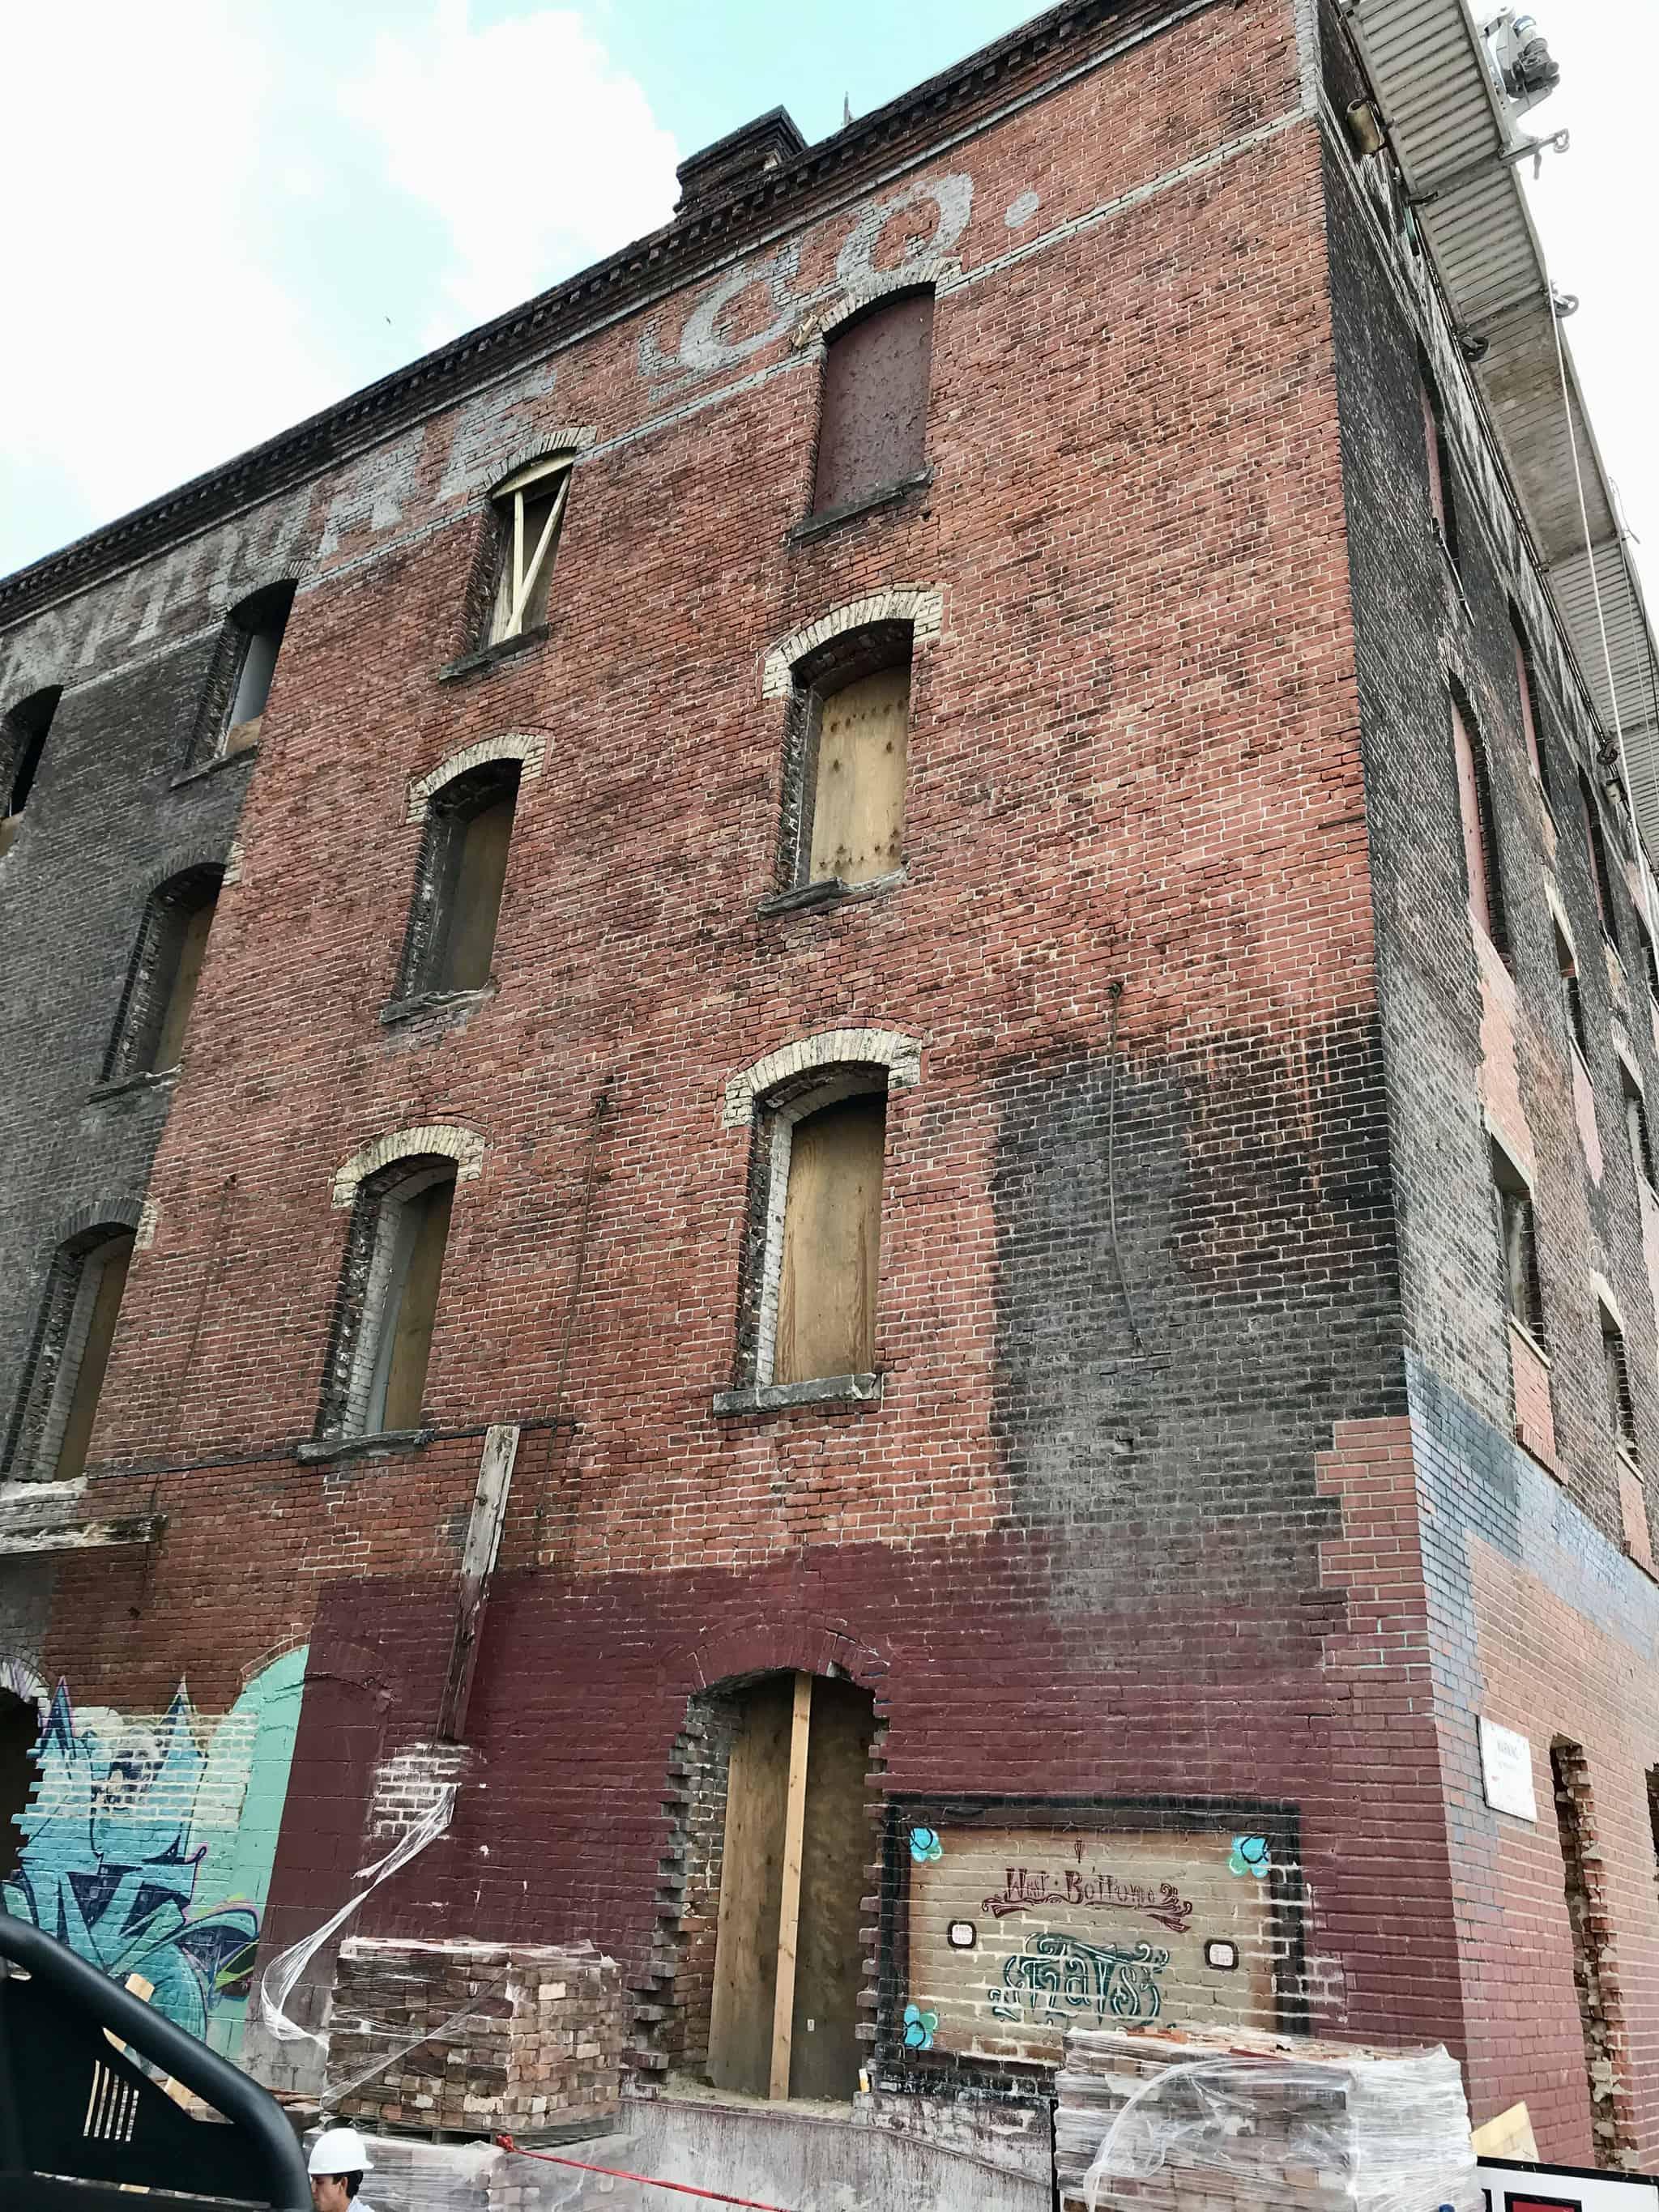 Abernathy Building restoration in Kansas City's industrial West Bottoms district.